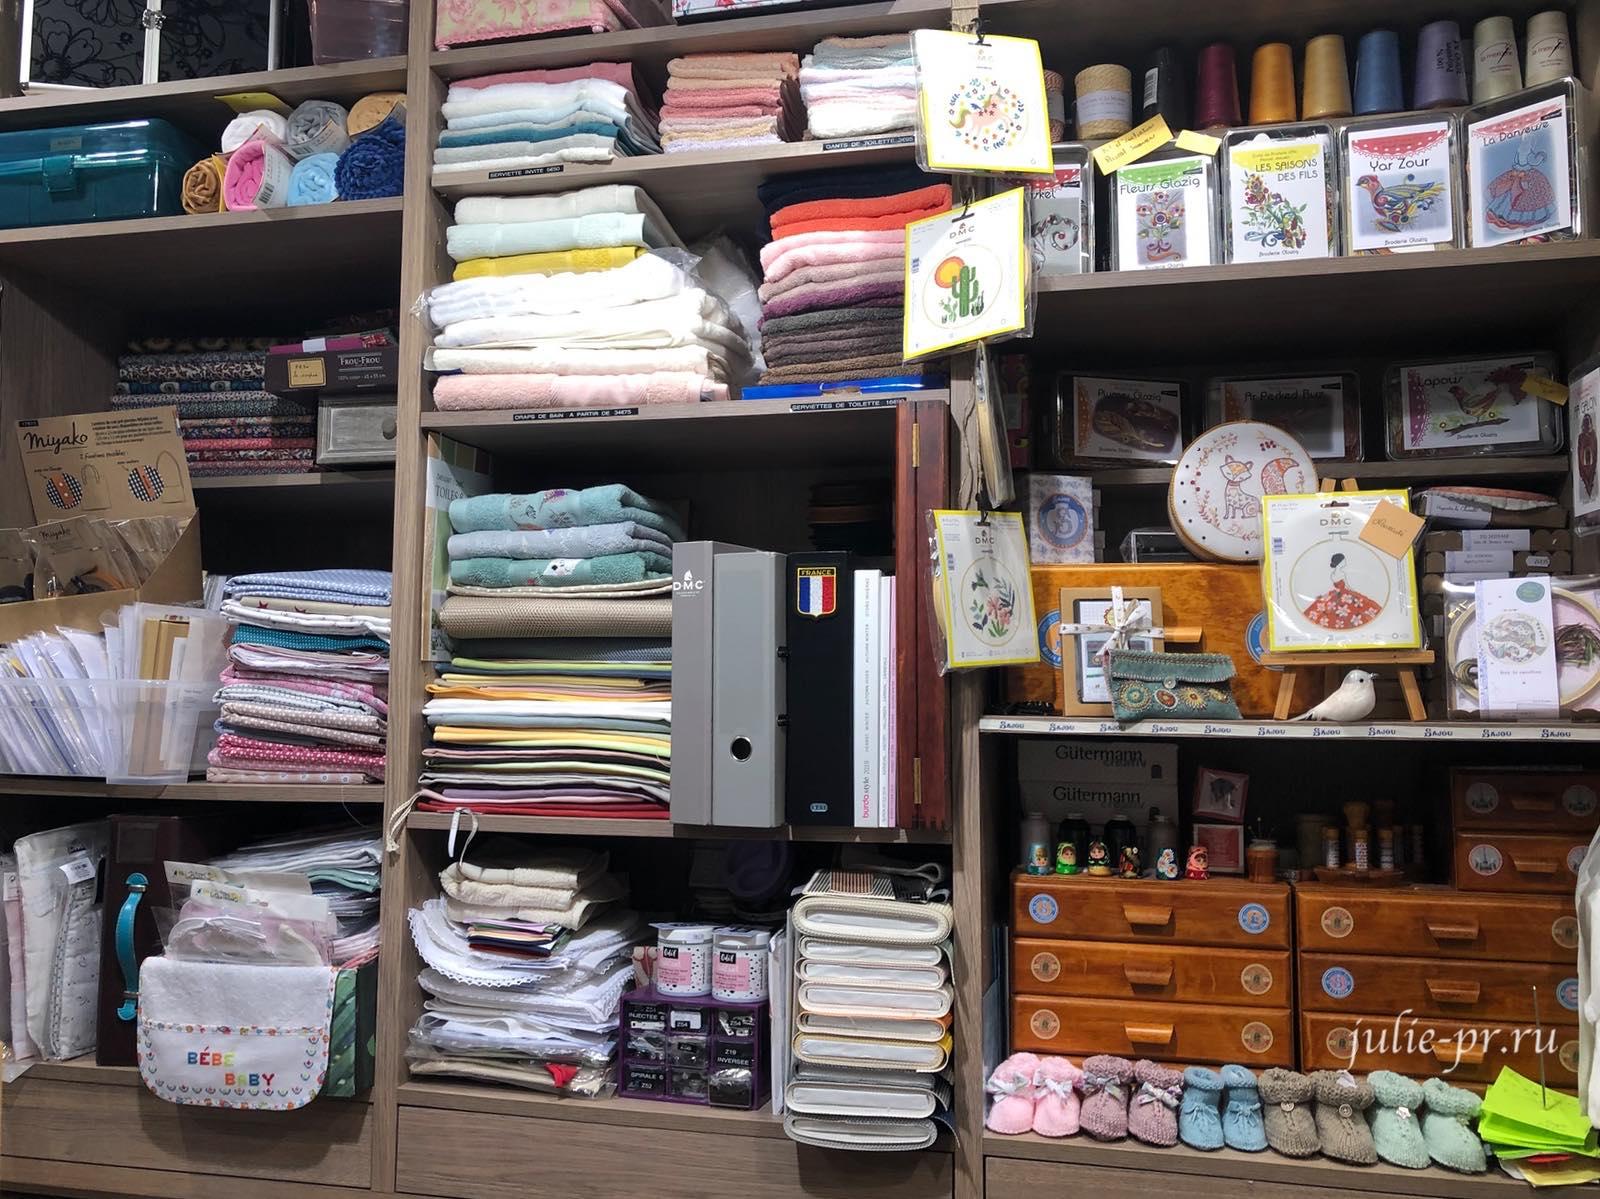 Магазин рукоделия Etamine, Динан, Франция, Бретань, магазин вышивки